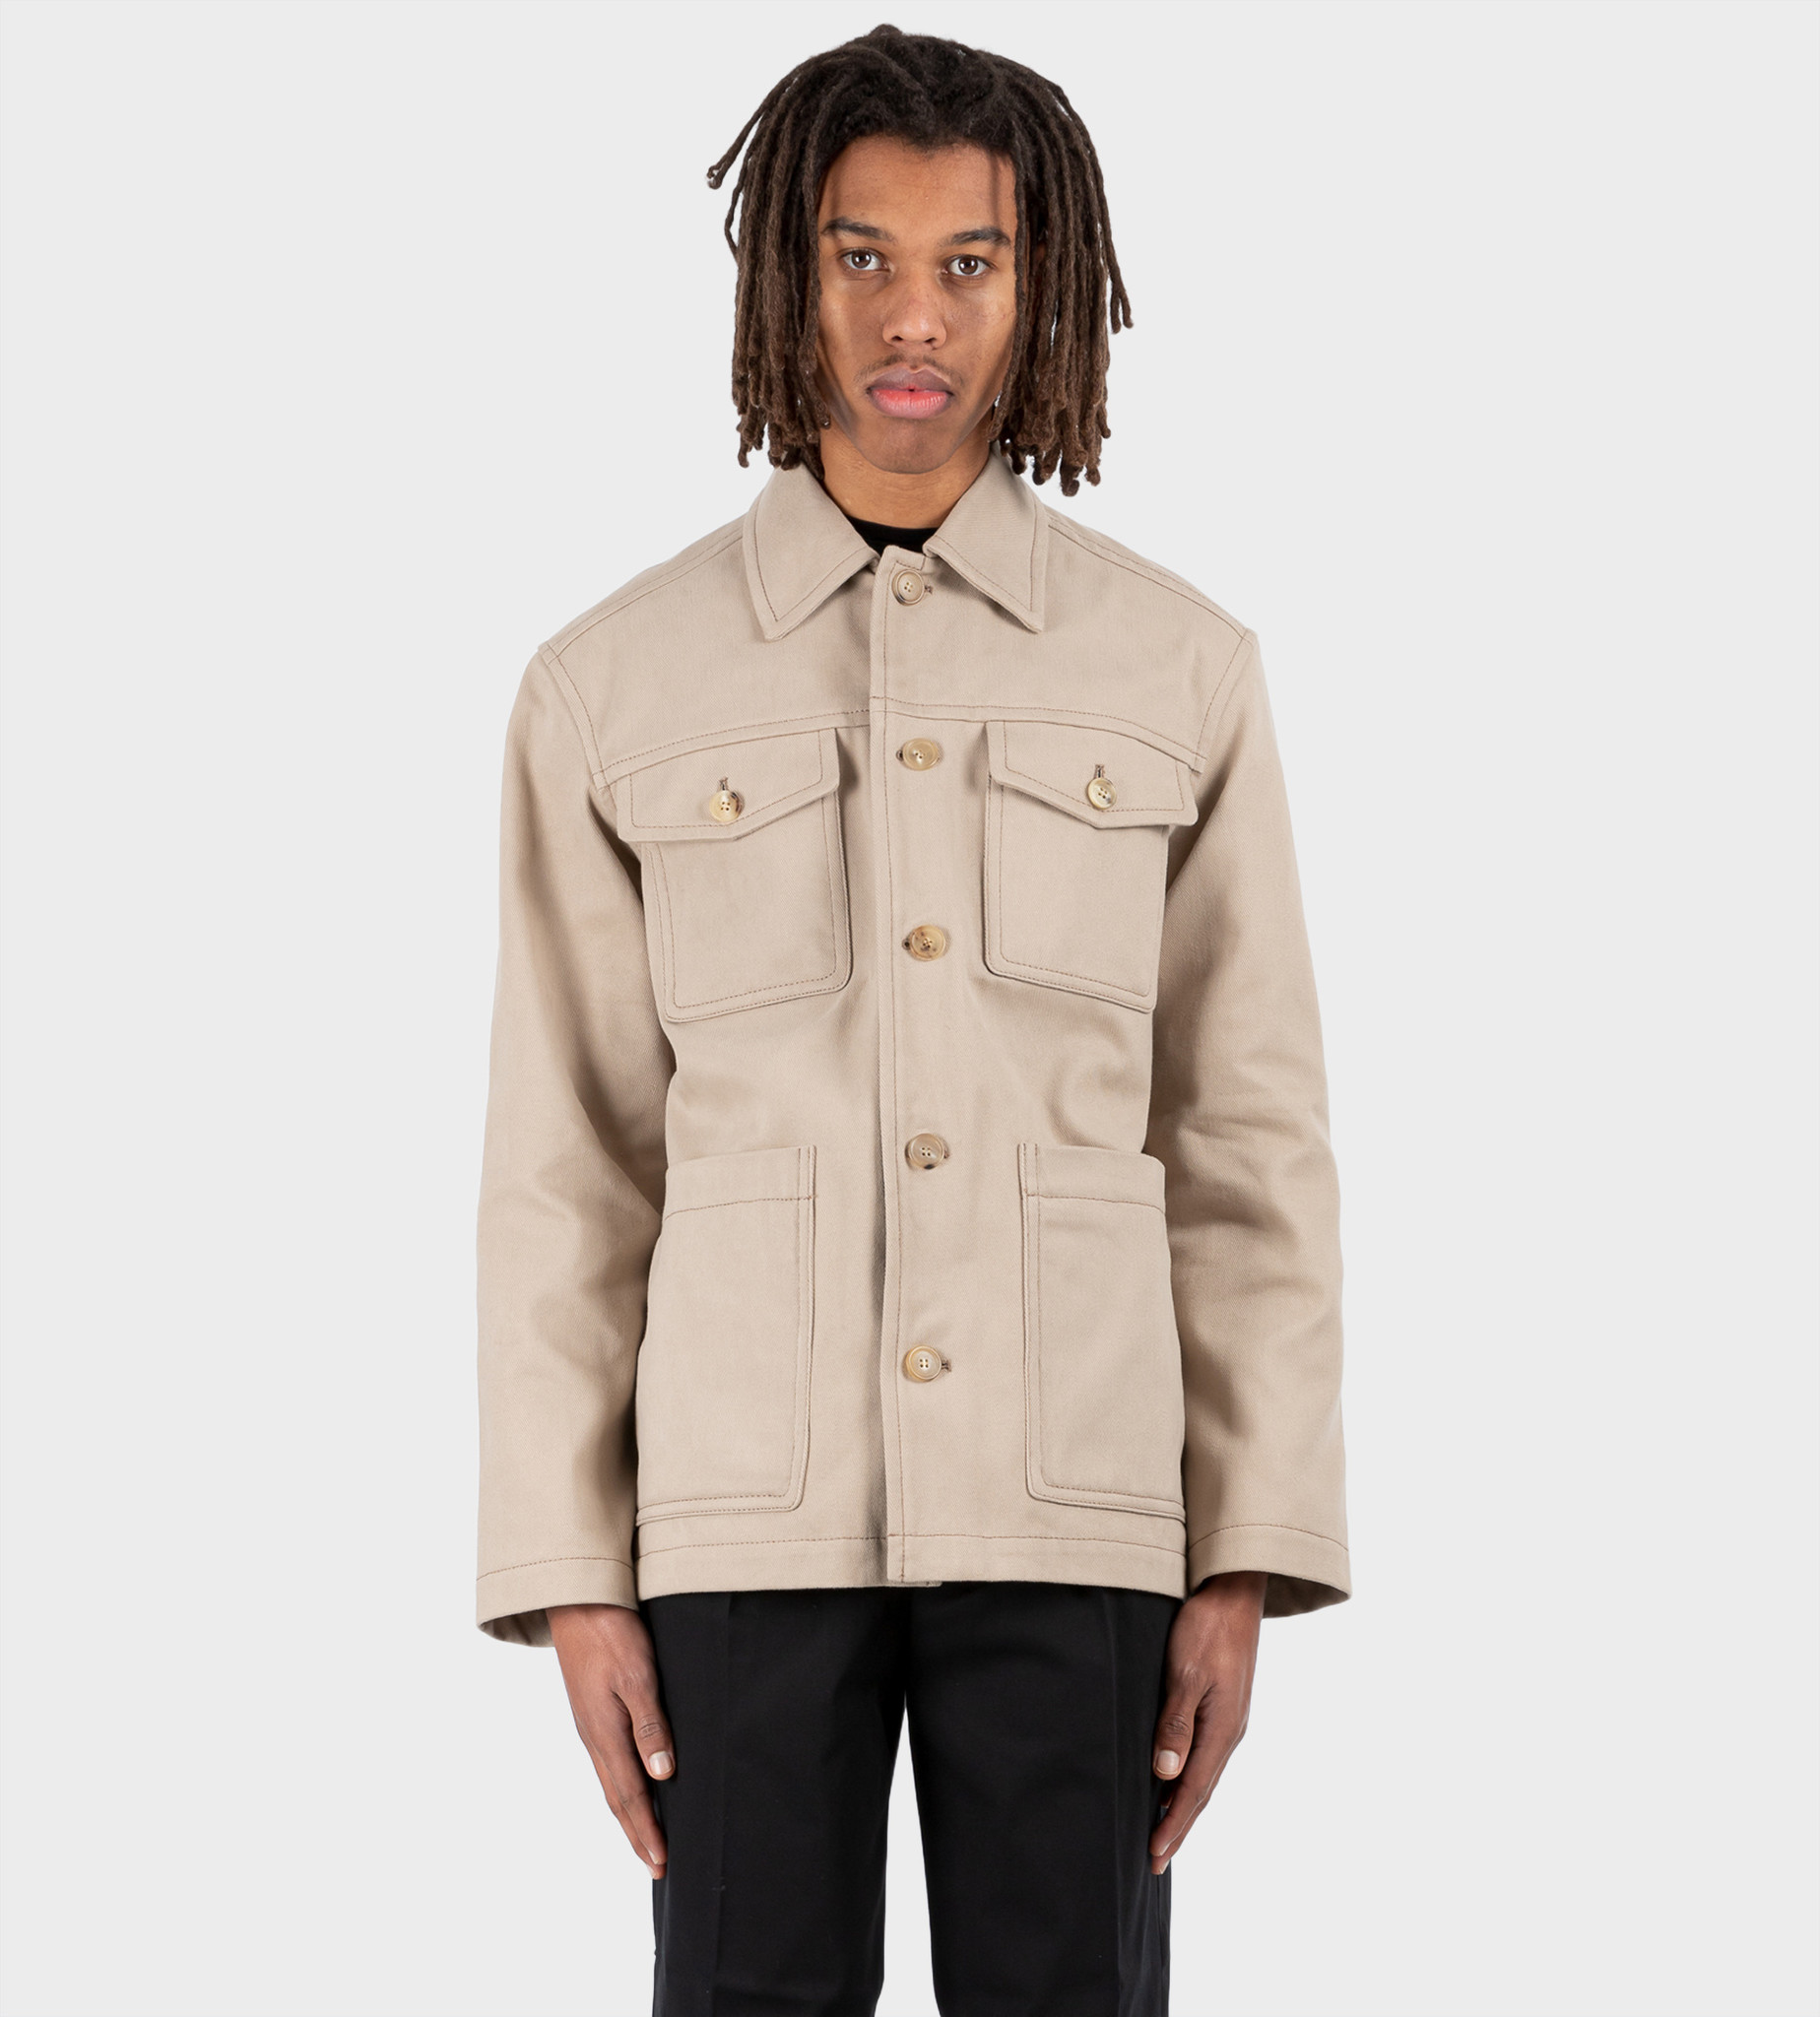 ACNE STUDIOS Cotton Shirt Jacket Hazel Beige